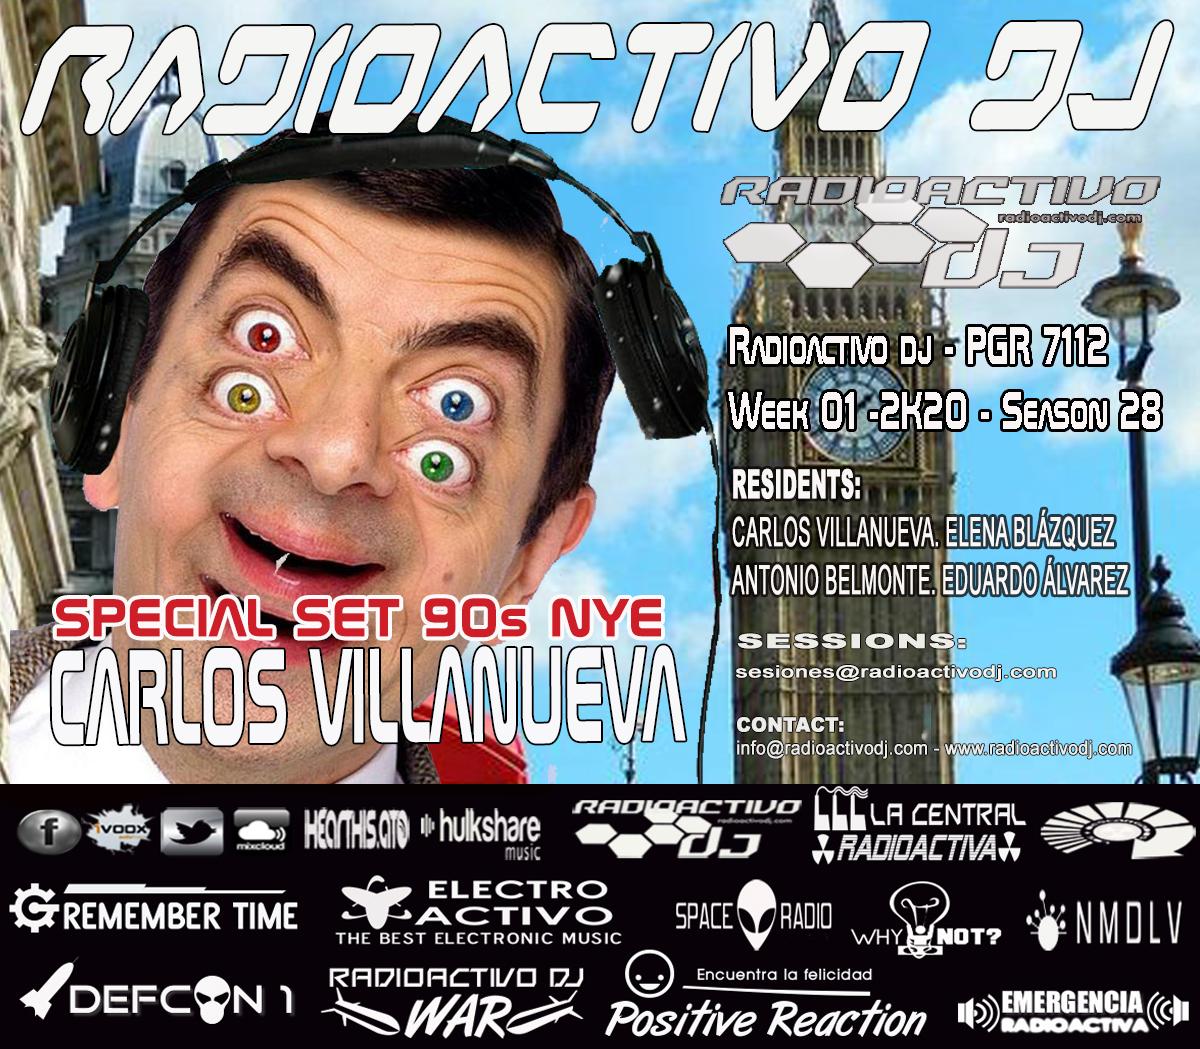 RADIOACTIVO-DJ-01-2020